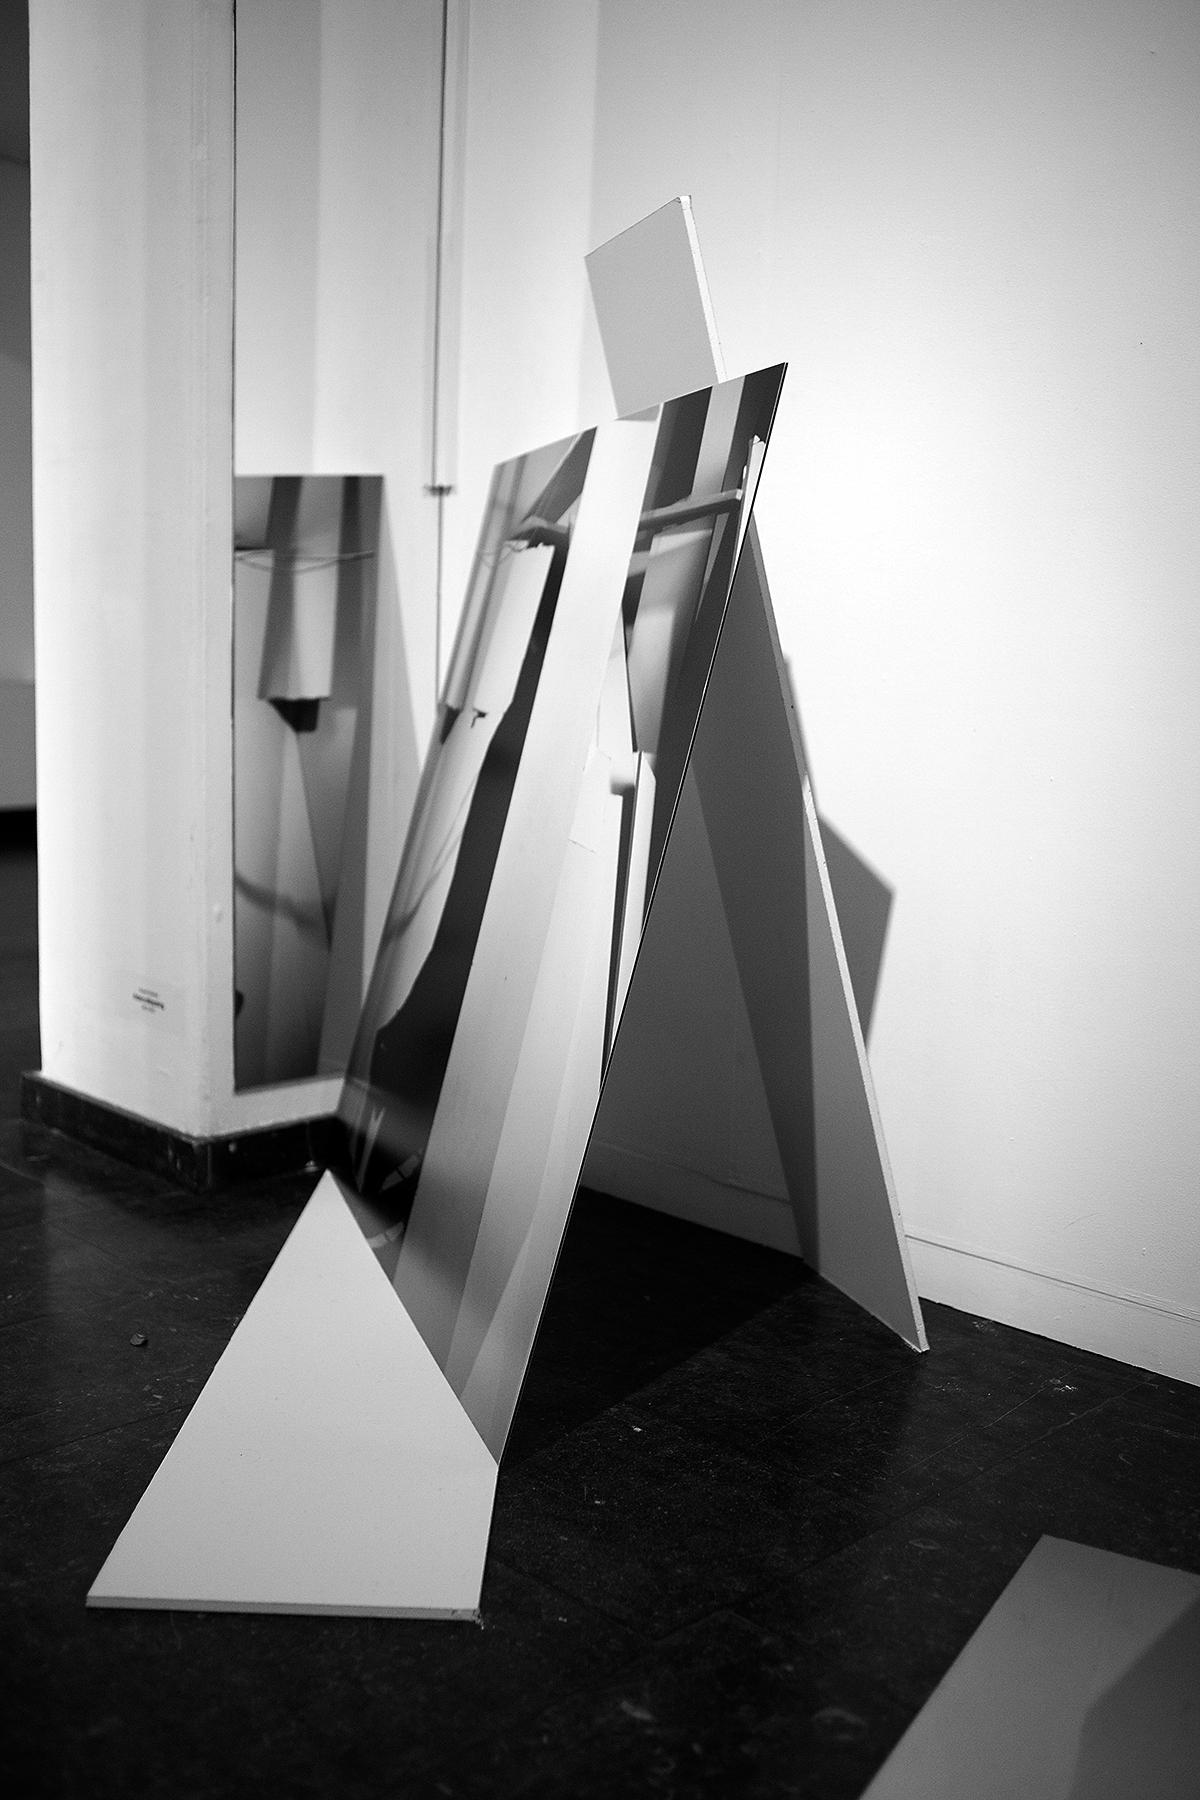 Intercollapsing, Second Act Festival 2011, De Brakke Grond, Amsterdam 2011